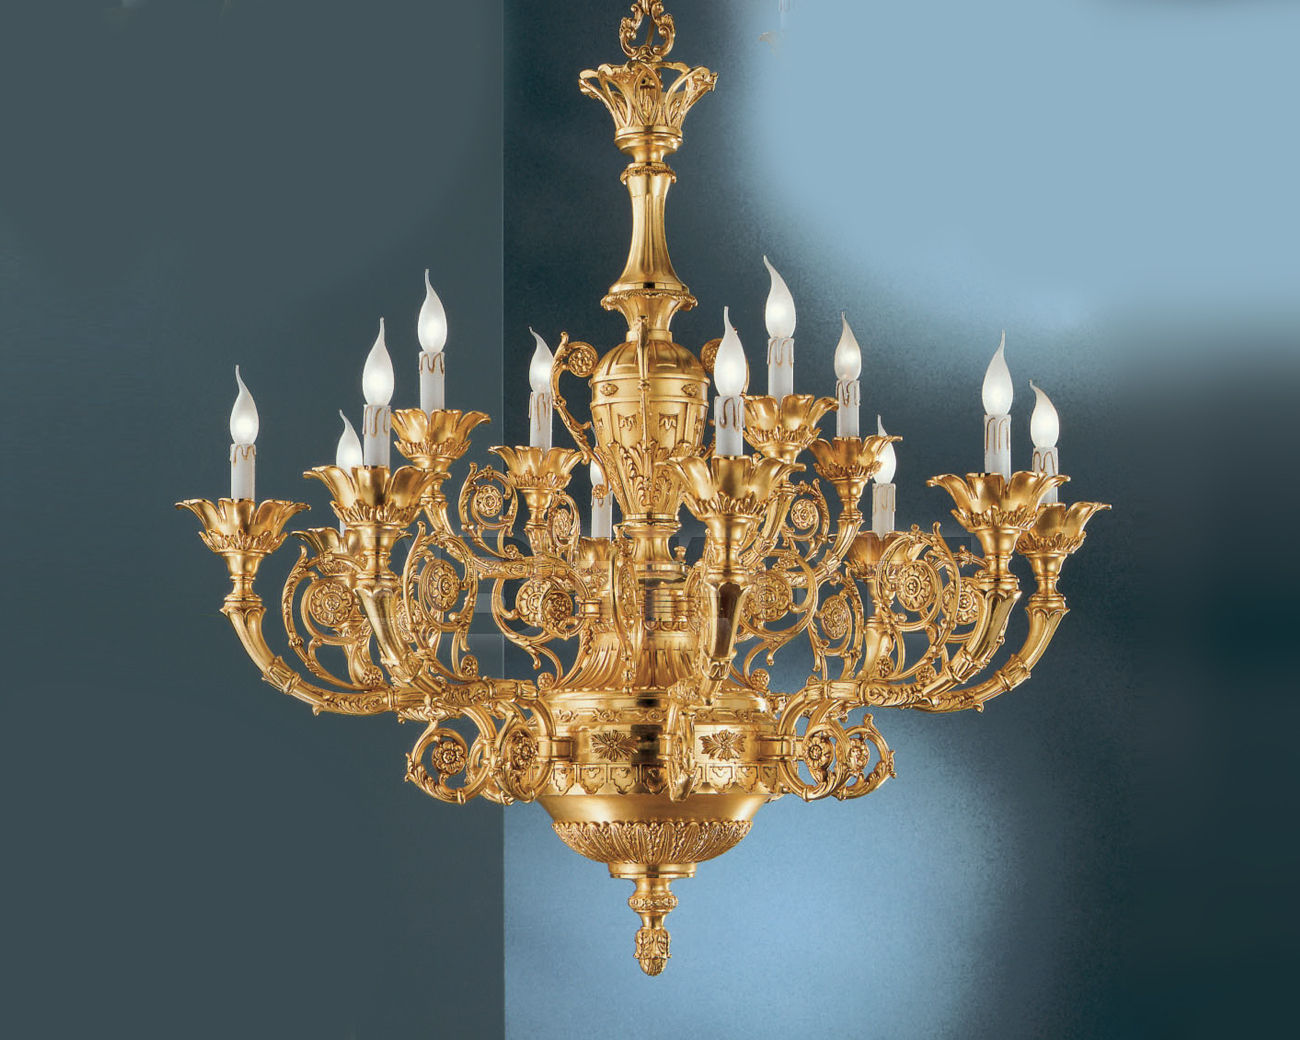 Купить Люстра F.B.A.I. Candeliere 4200/8+4